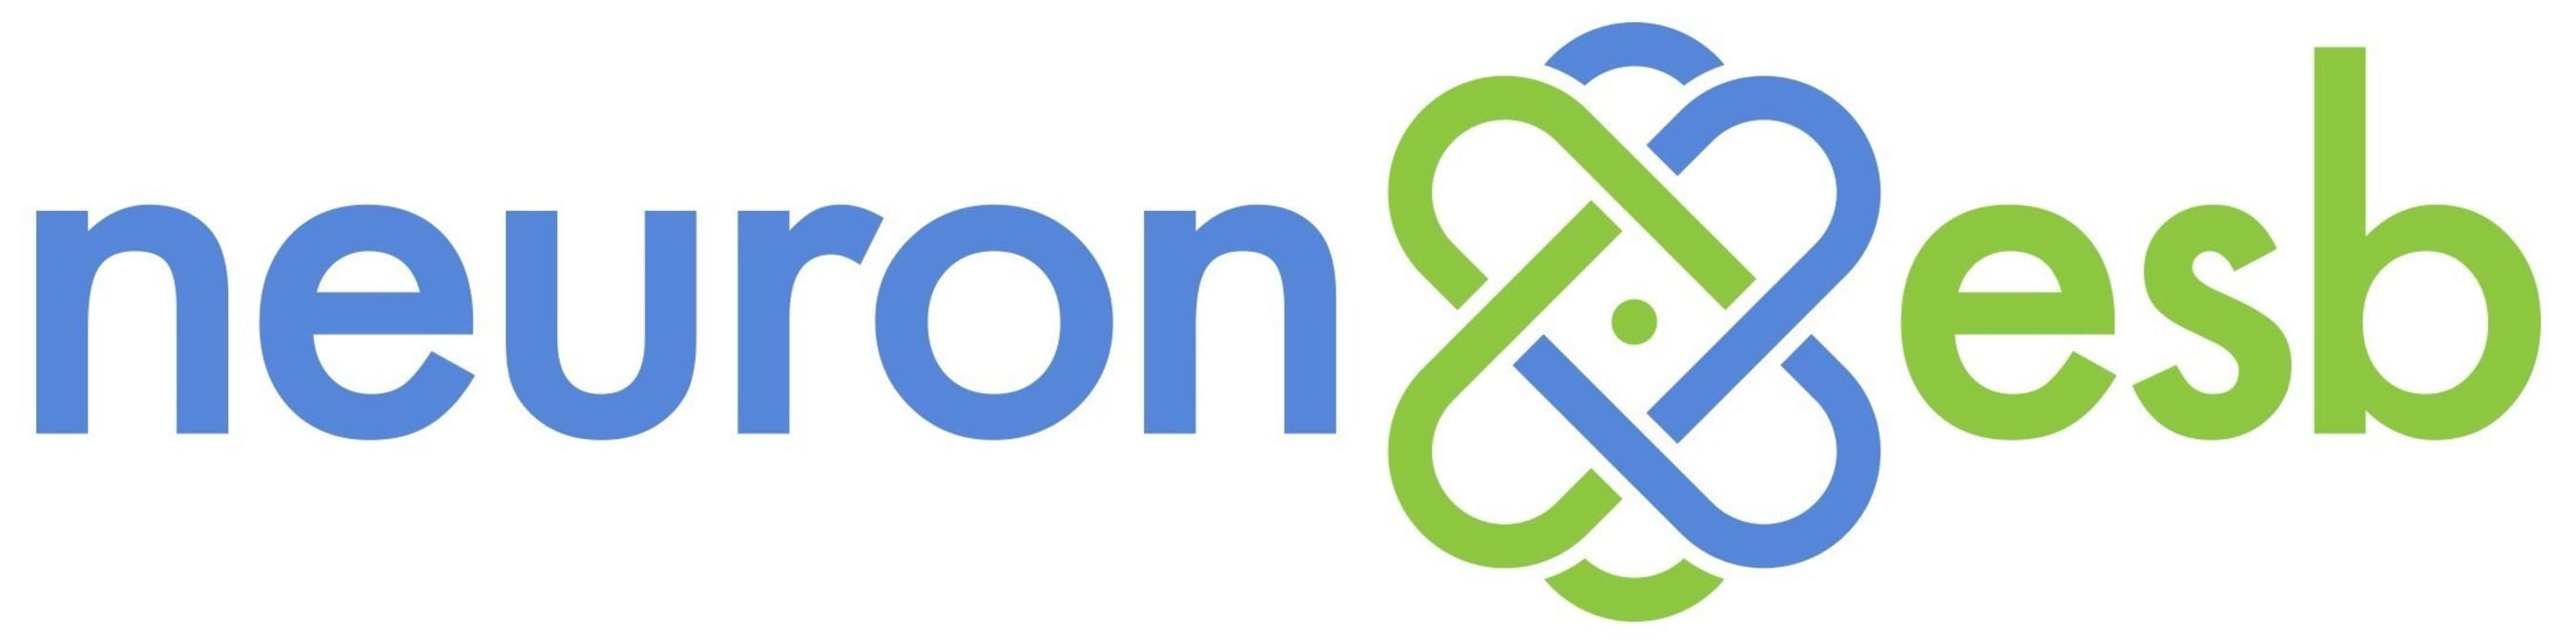 Neuron ESB is an easy-to-use enterprise service bus (PRNewsFoto/Neuron ESB)